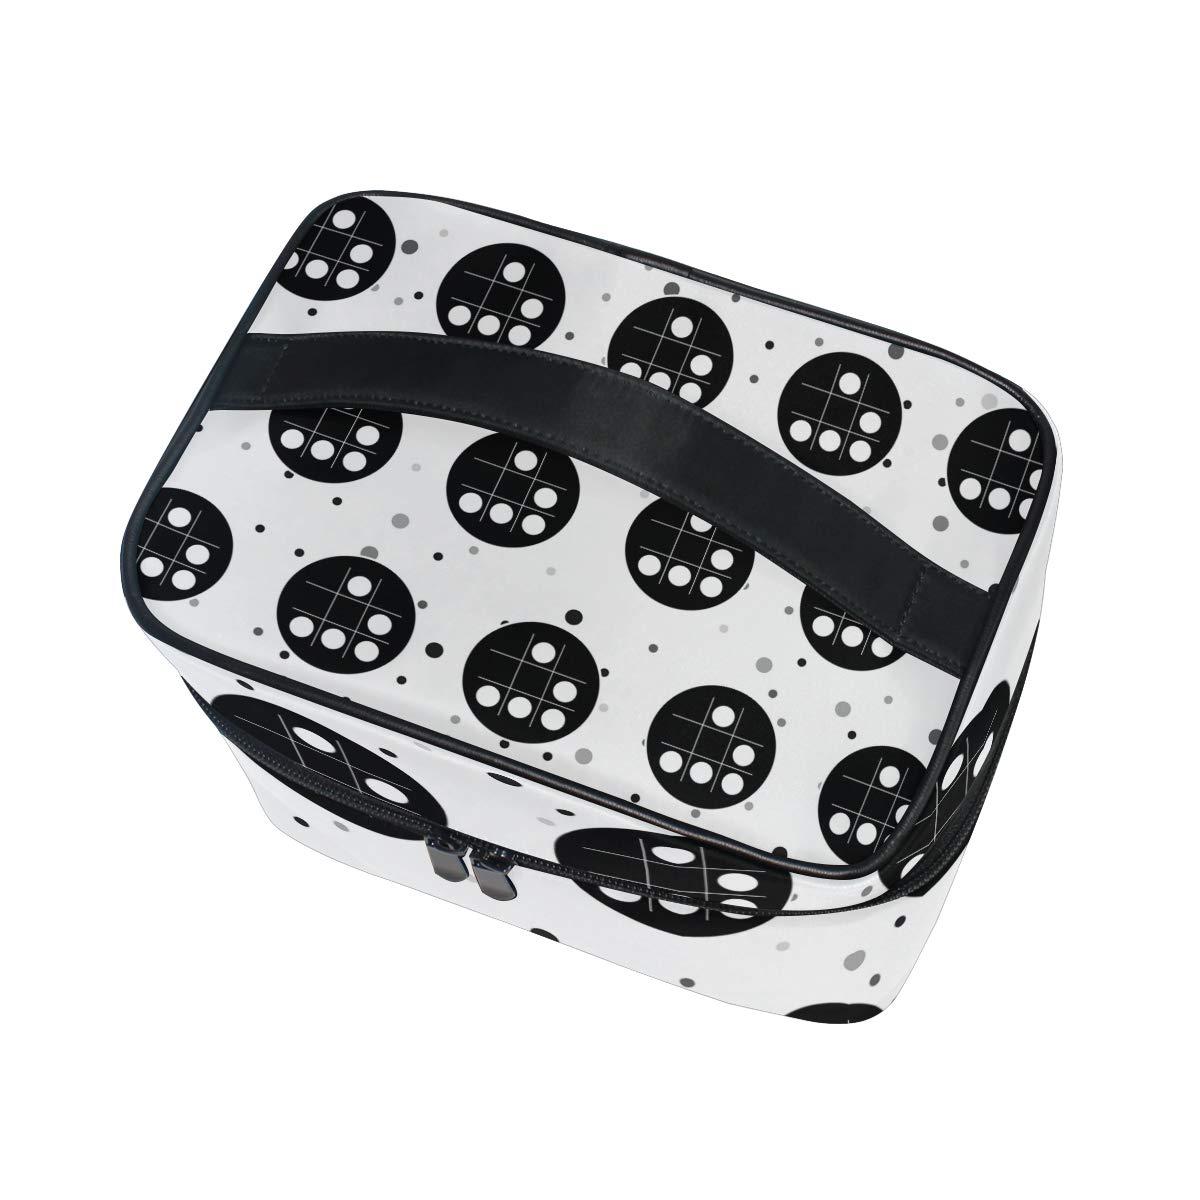 Amazon.com: Hacker Emblem Organizador de bolsas de ...